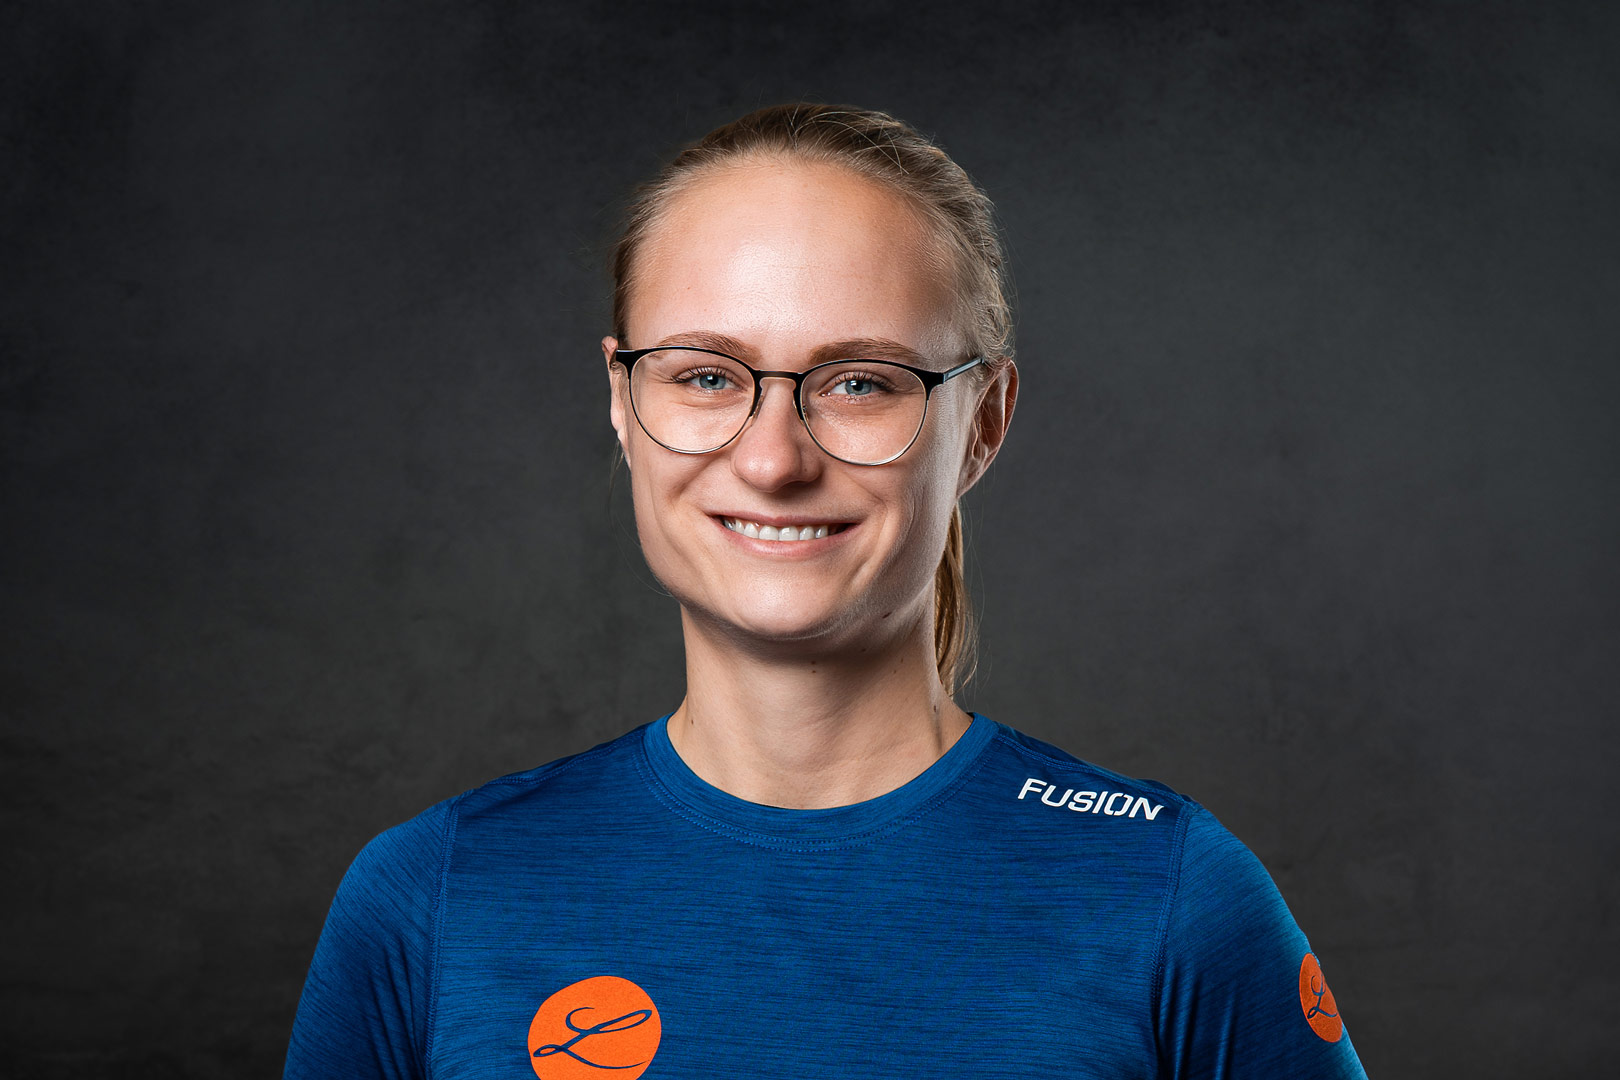 Anne Pinzke